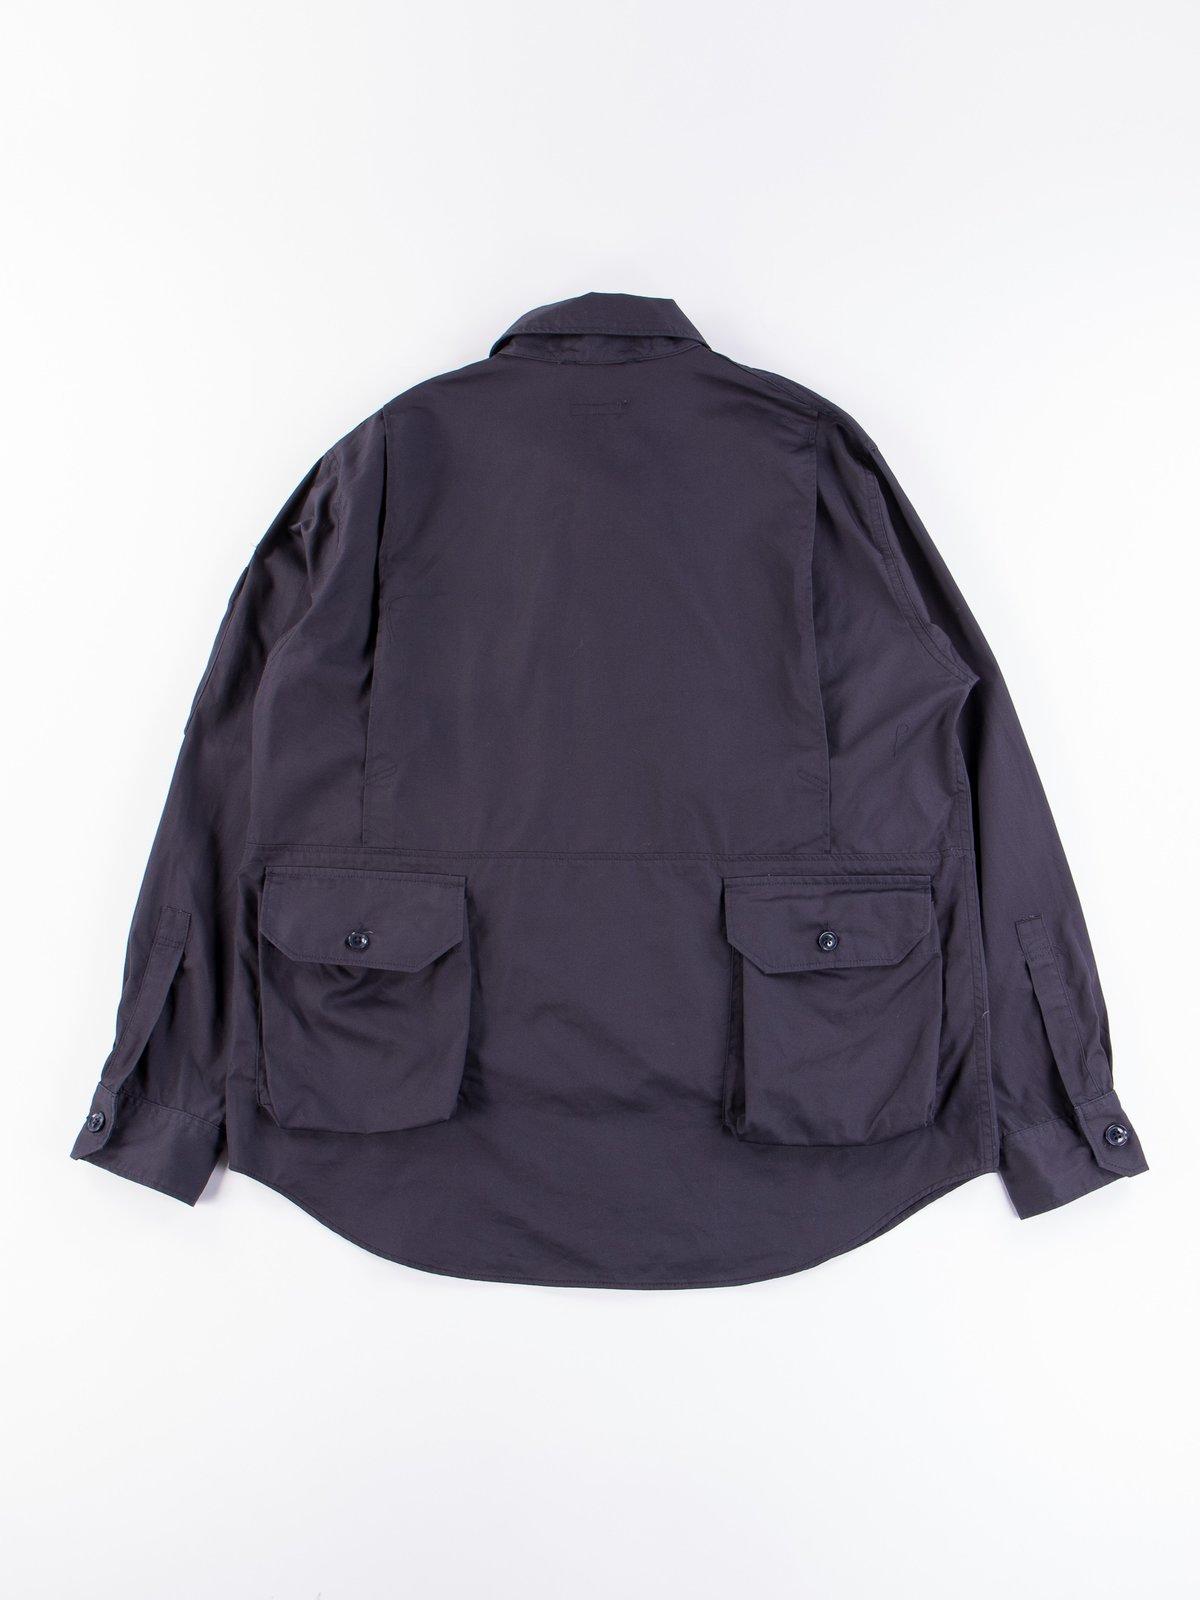 Dark Navy Highcount Twill Explorer Shirt Jacket - Image 7